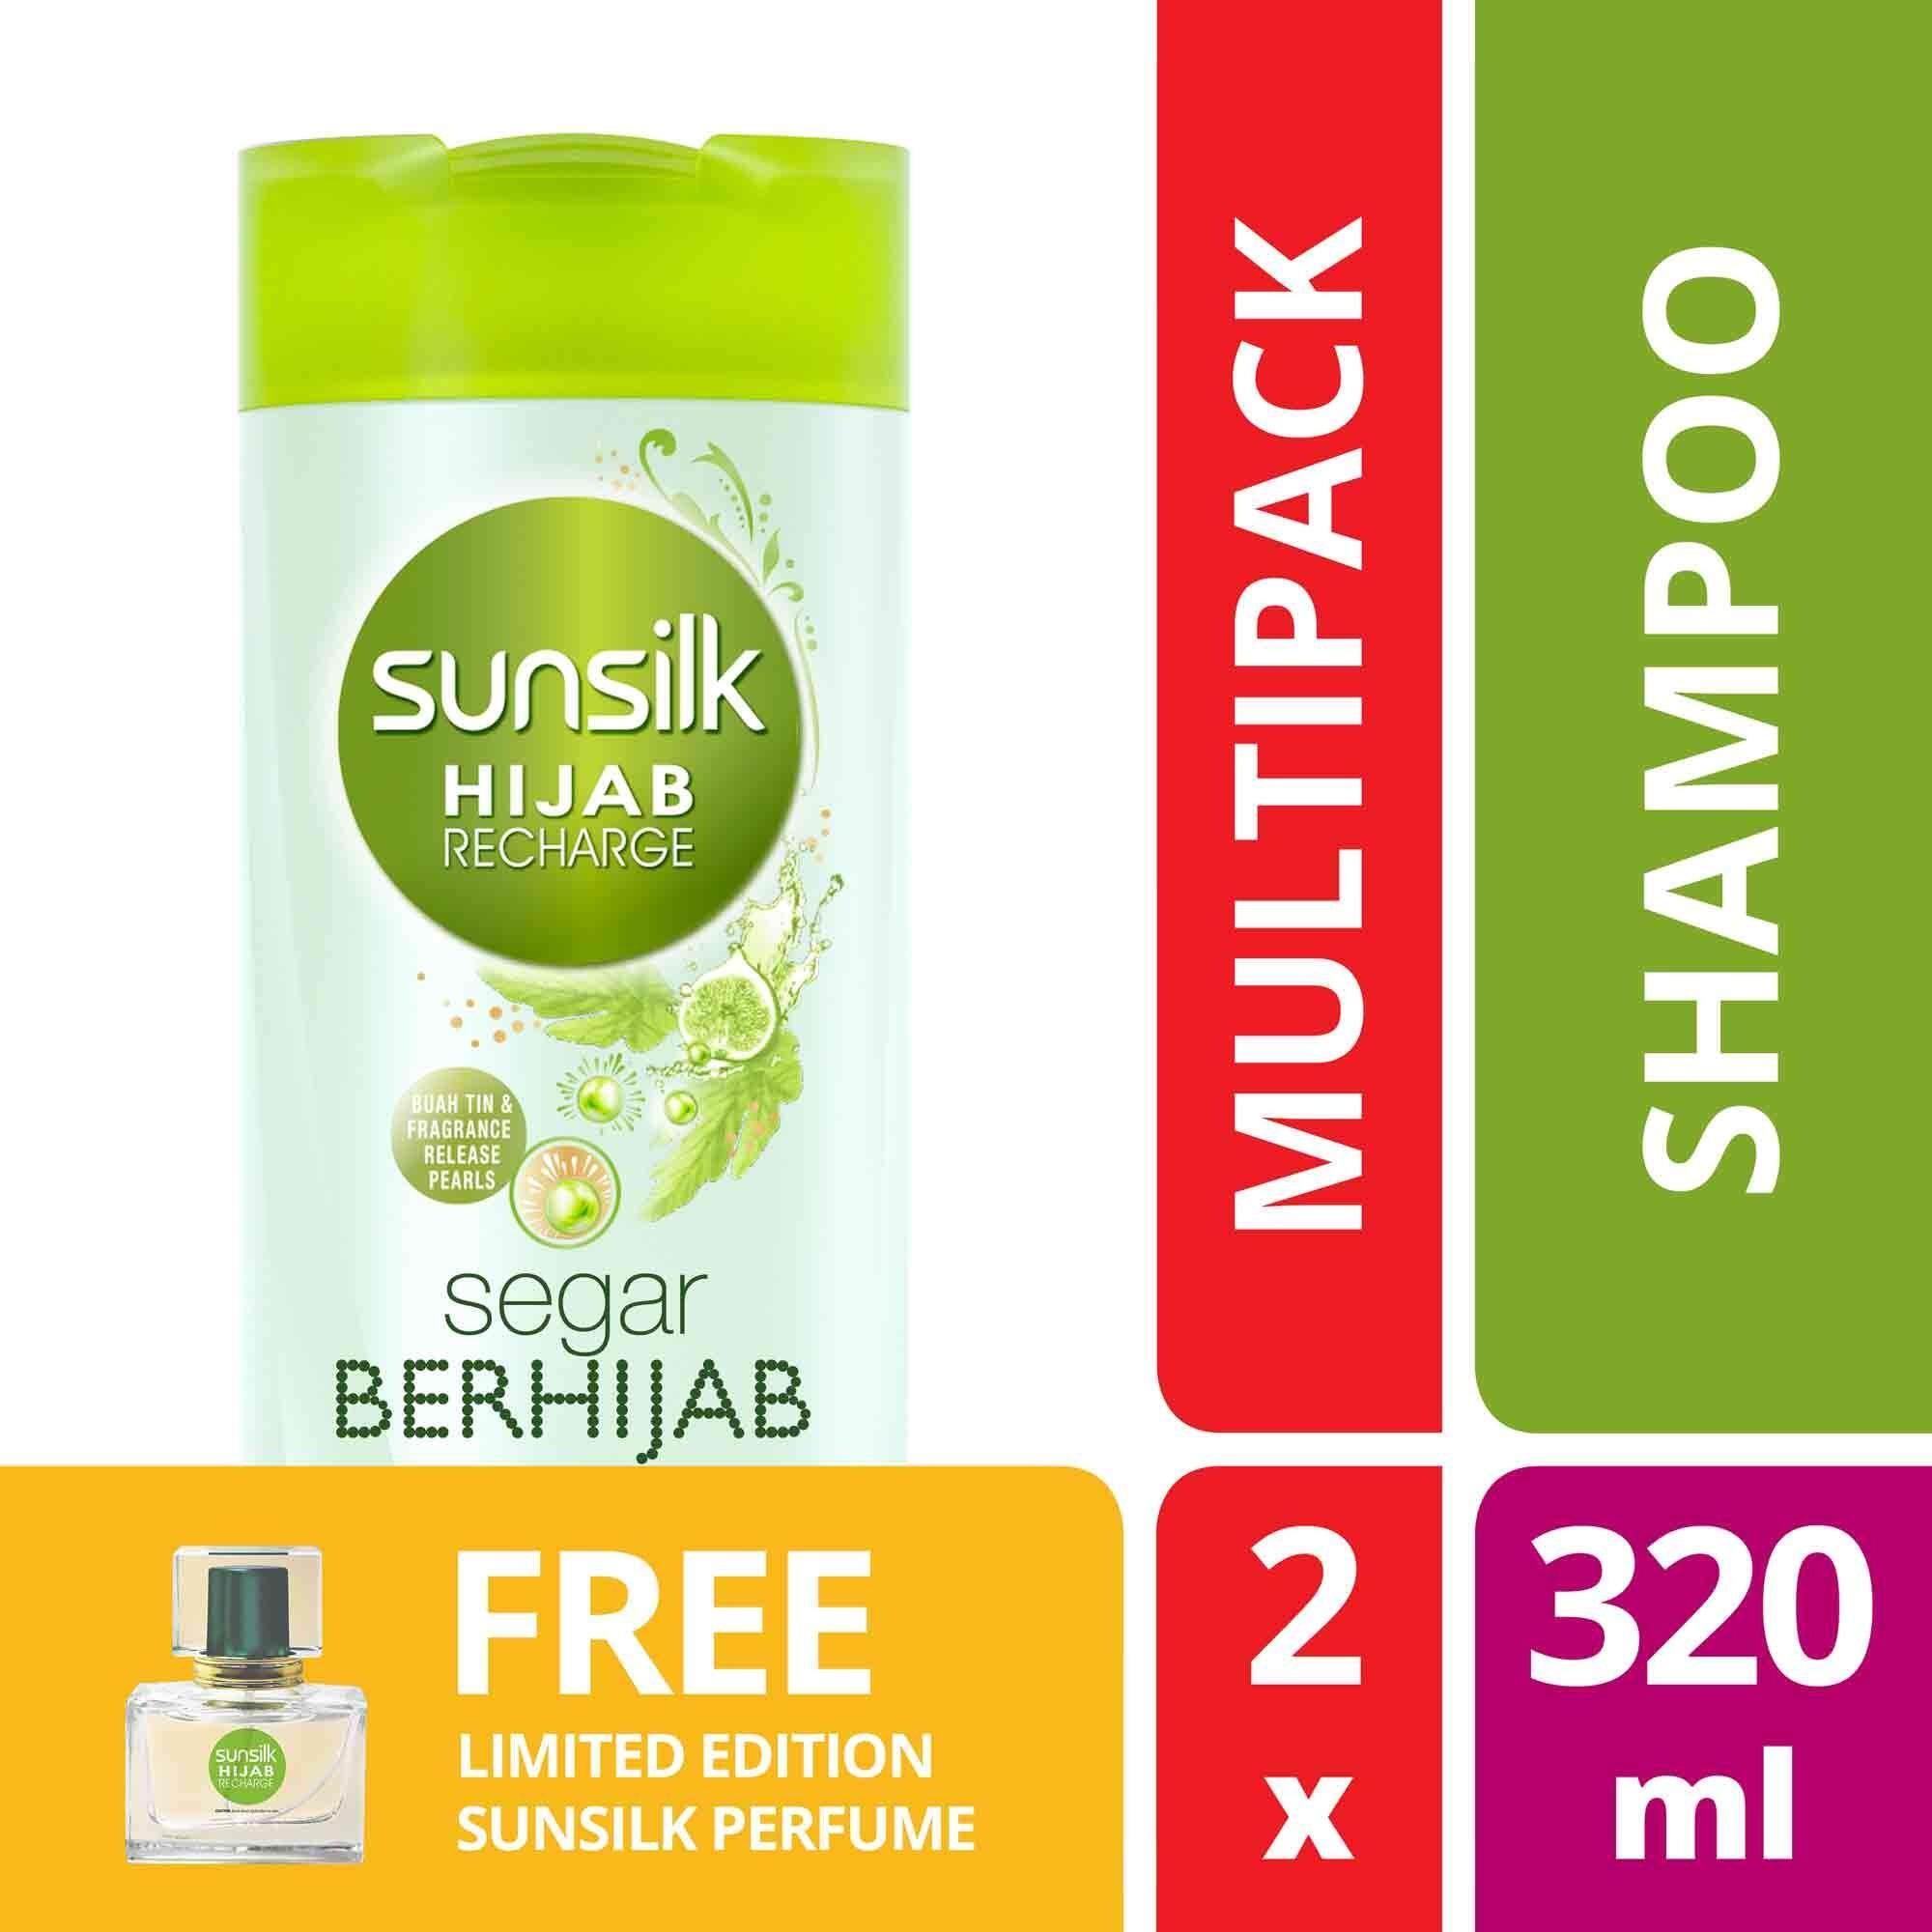 Sell Sunsilk Hijab Shampoo Cheapest Best Quality My Store Sari Ayu Hair Fall 180ml Myr 26